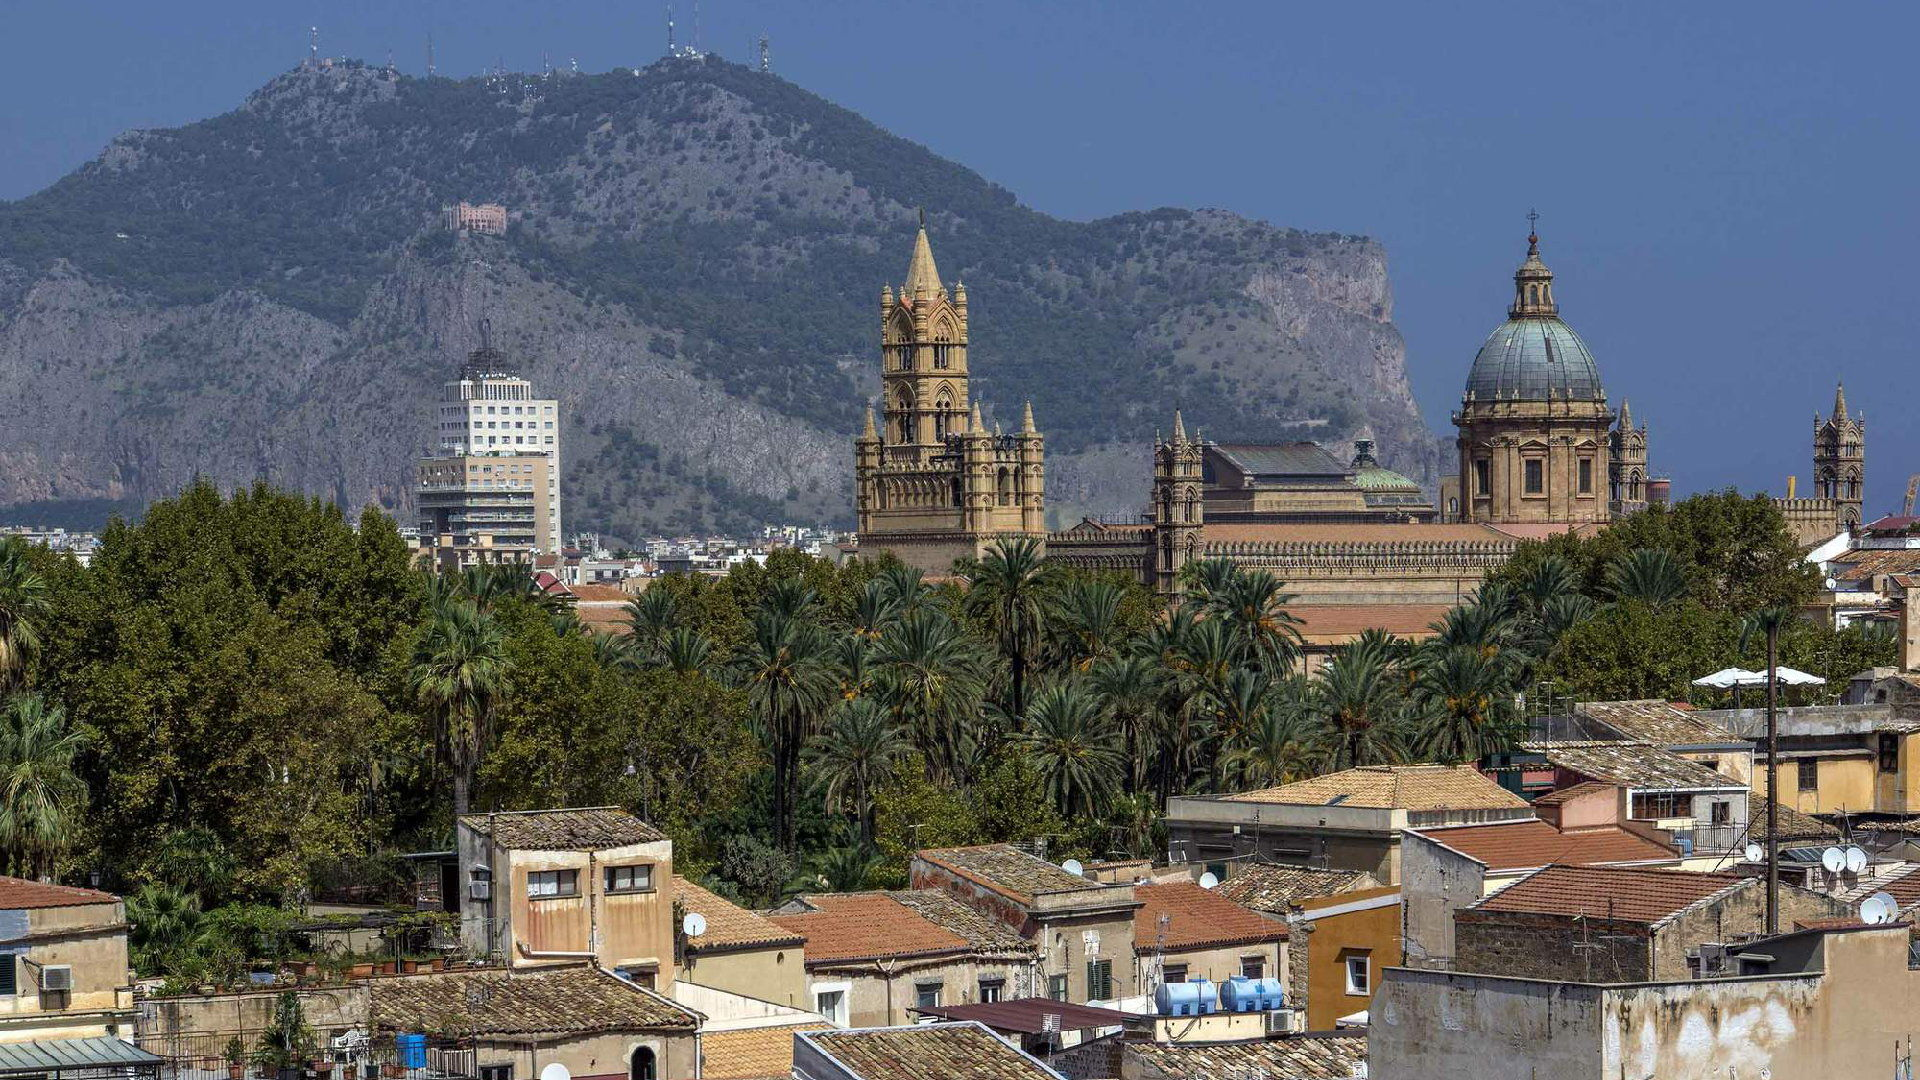 Palermo v Itálii – Pizza, mafia i úžasné památky v podrobném průvodci